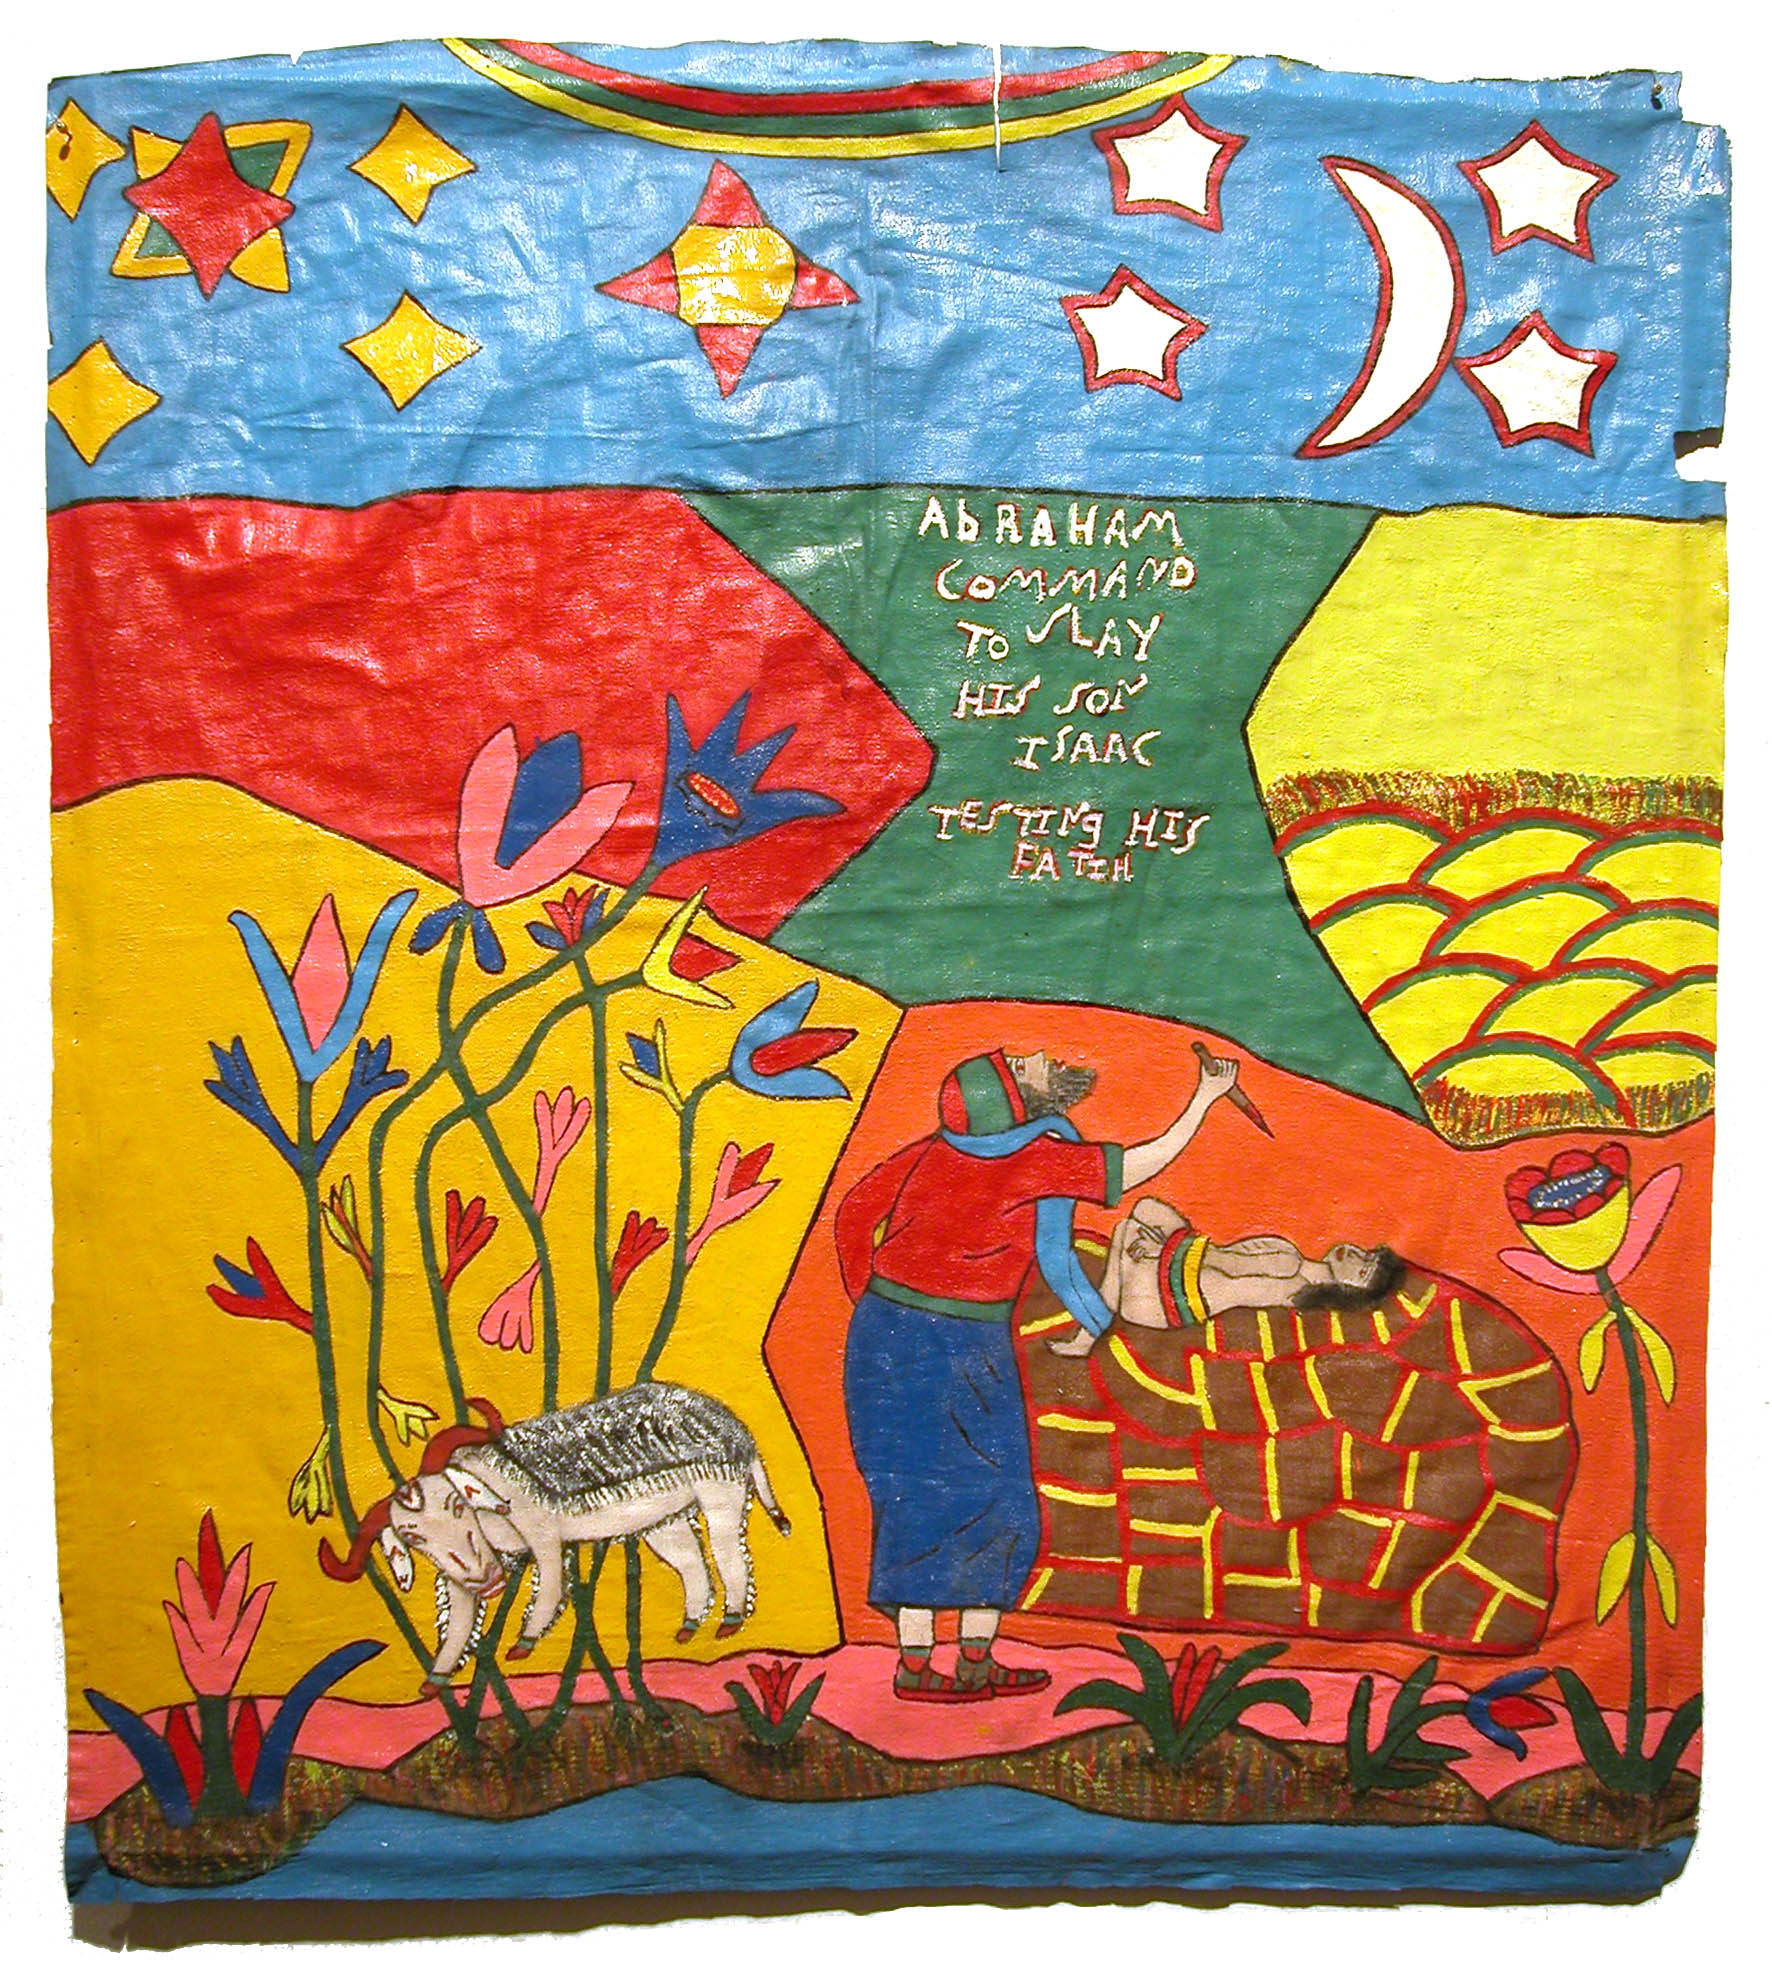 Elijah    Abraham Command to Slay his son Isaac... Testing His Faith  , 1996 Enamel/canvas 26.75 x 24.5 in / 67.9 x 62.2 cm / Eli 3